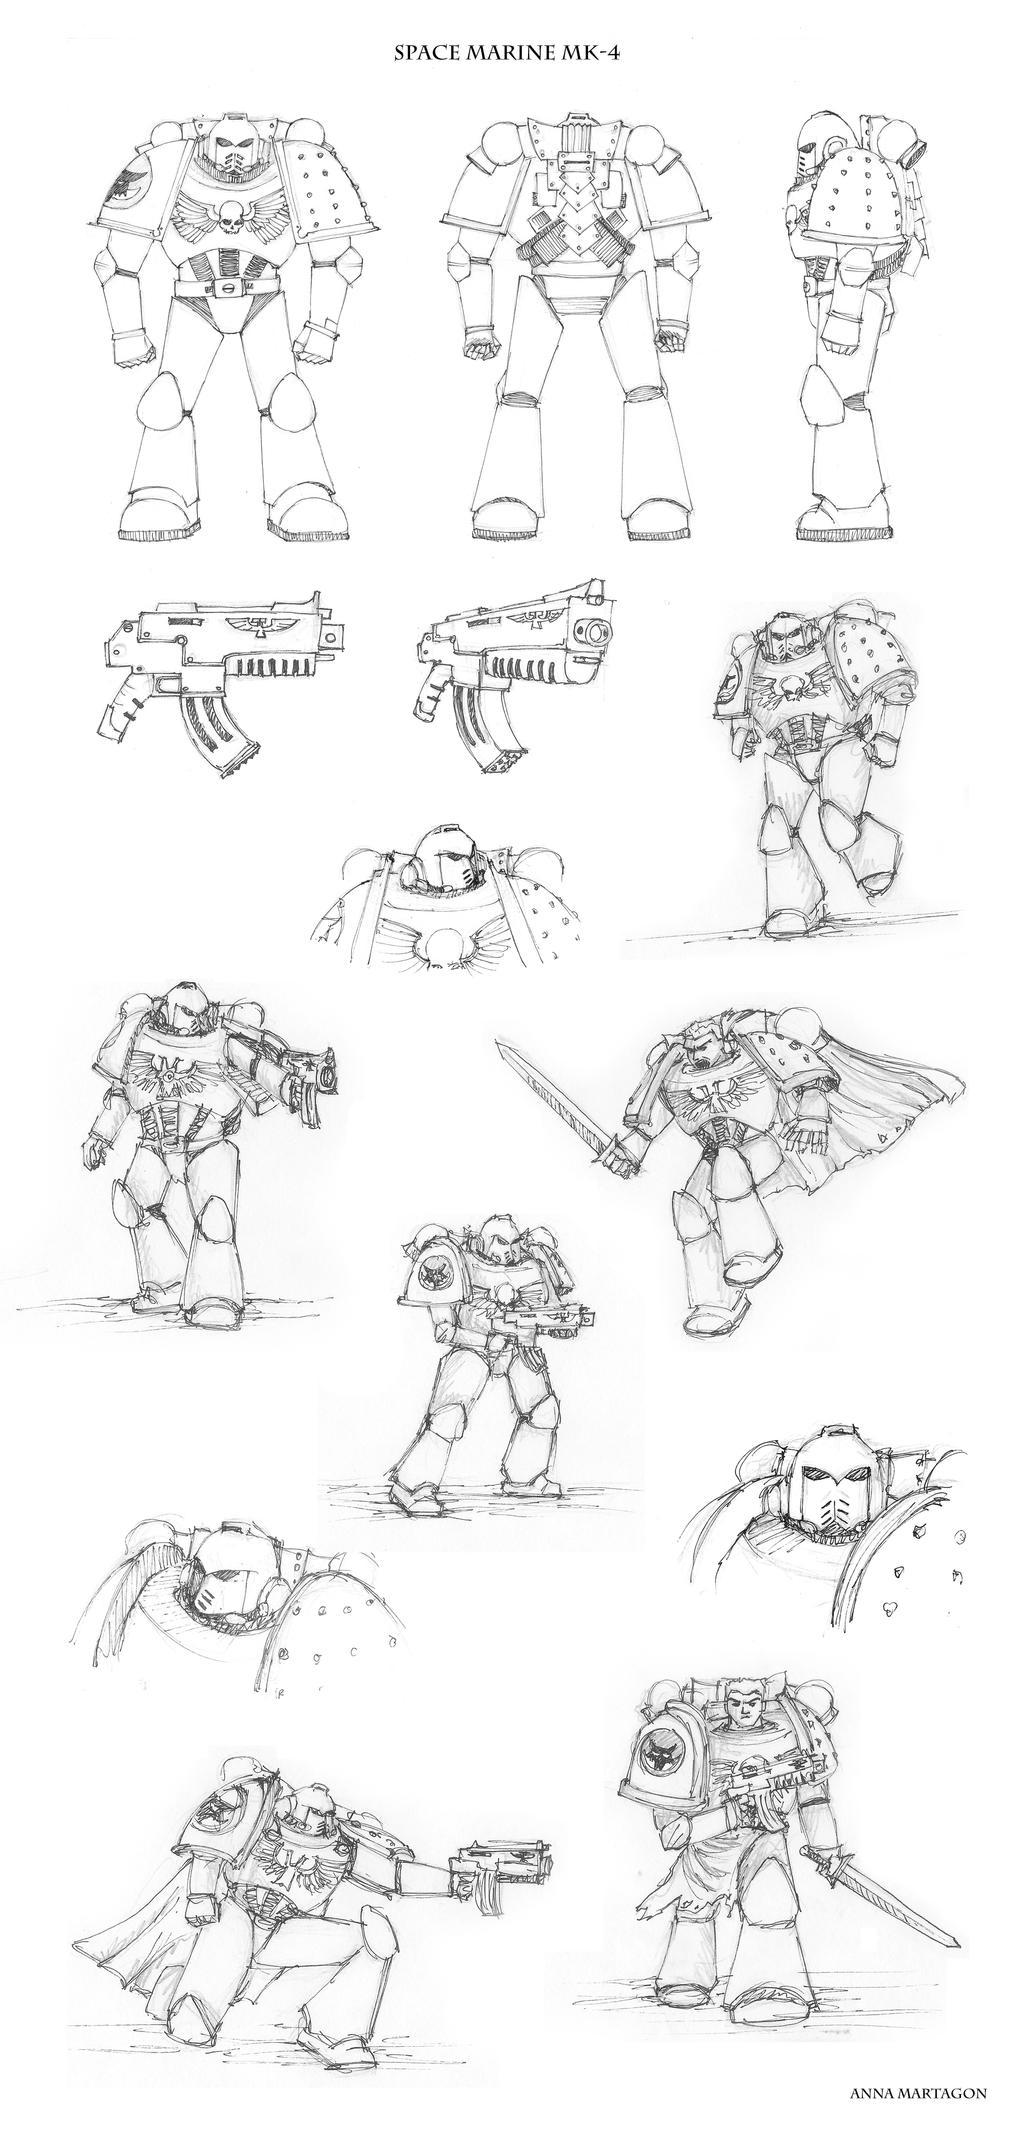 Space Marine MK-4 sketches